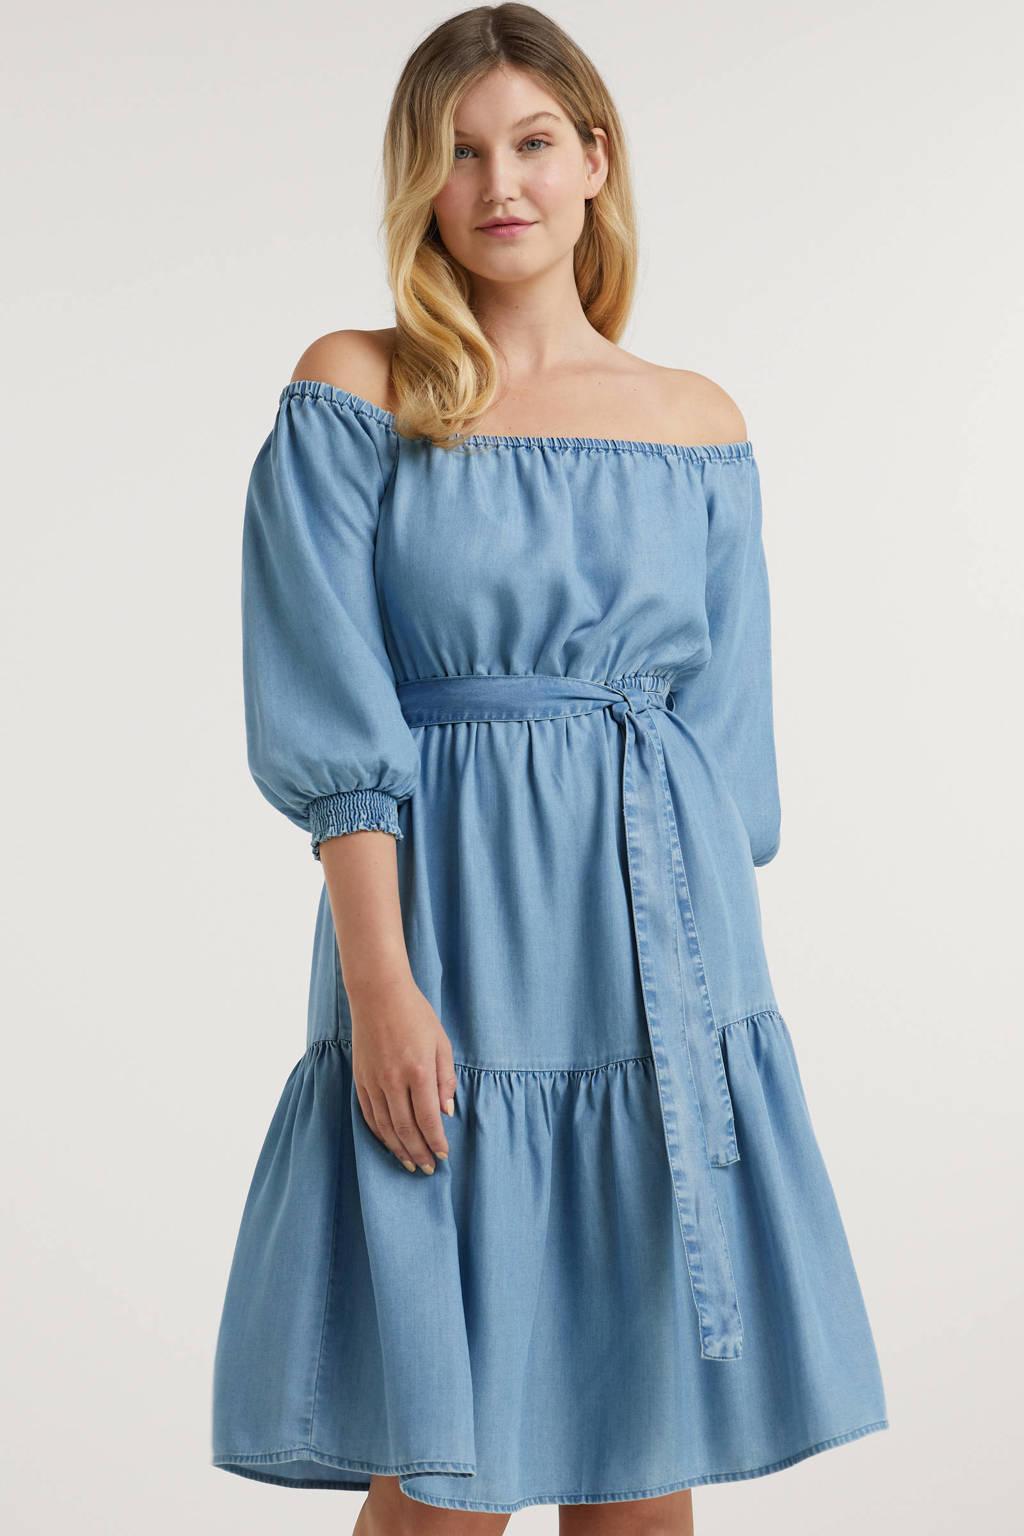 Miljuschka by Wehkamp on-off shoulder jurk tencel blauw, Blauw